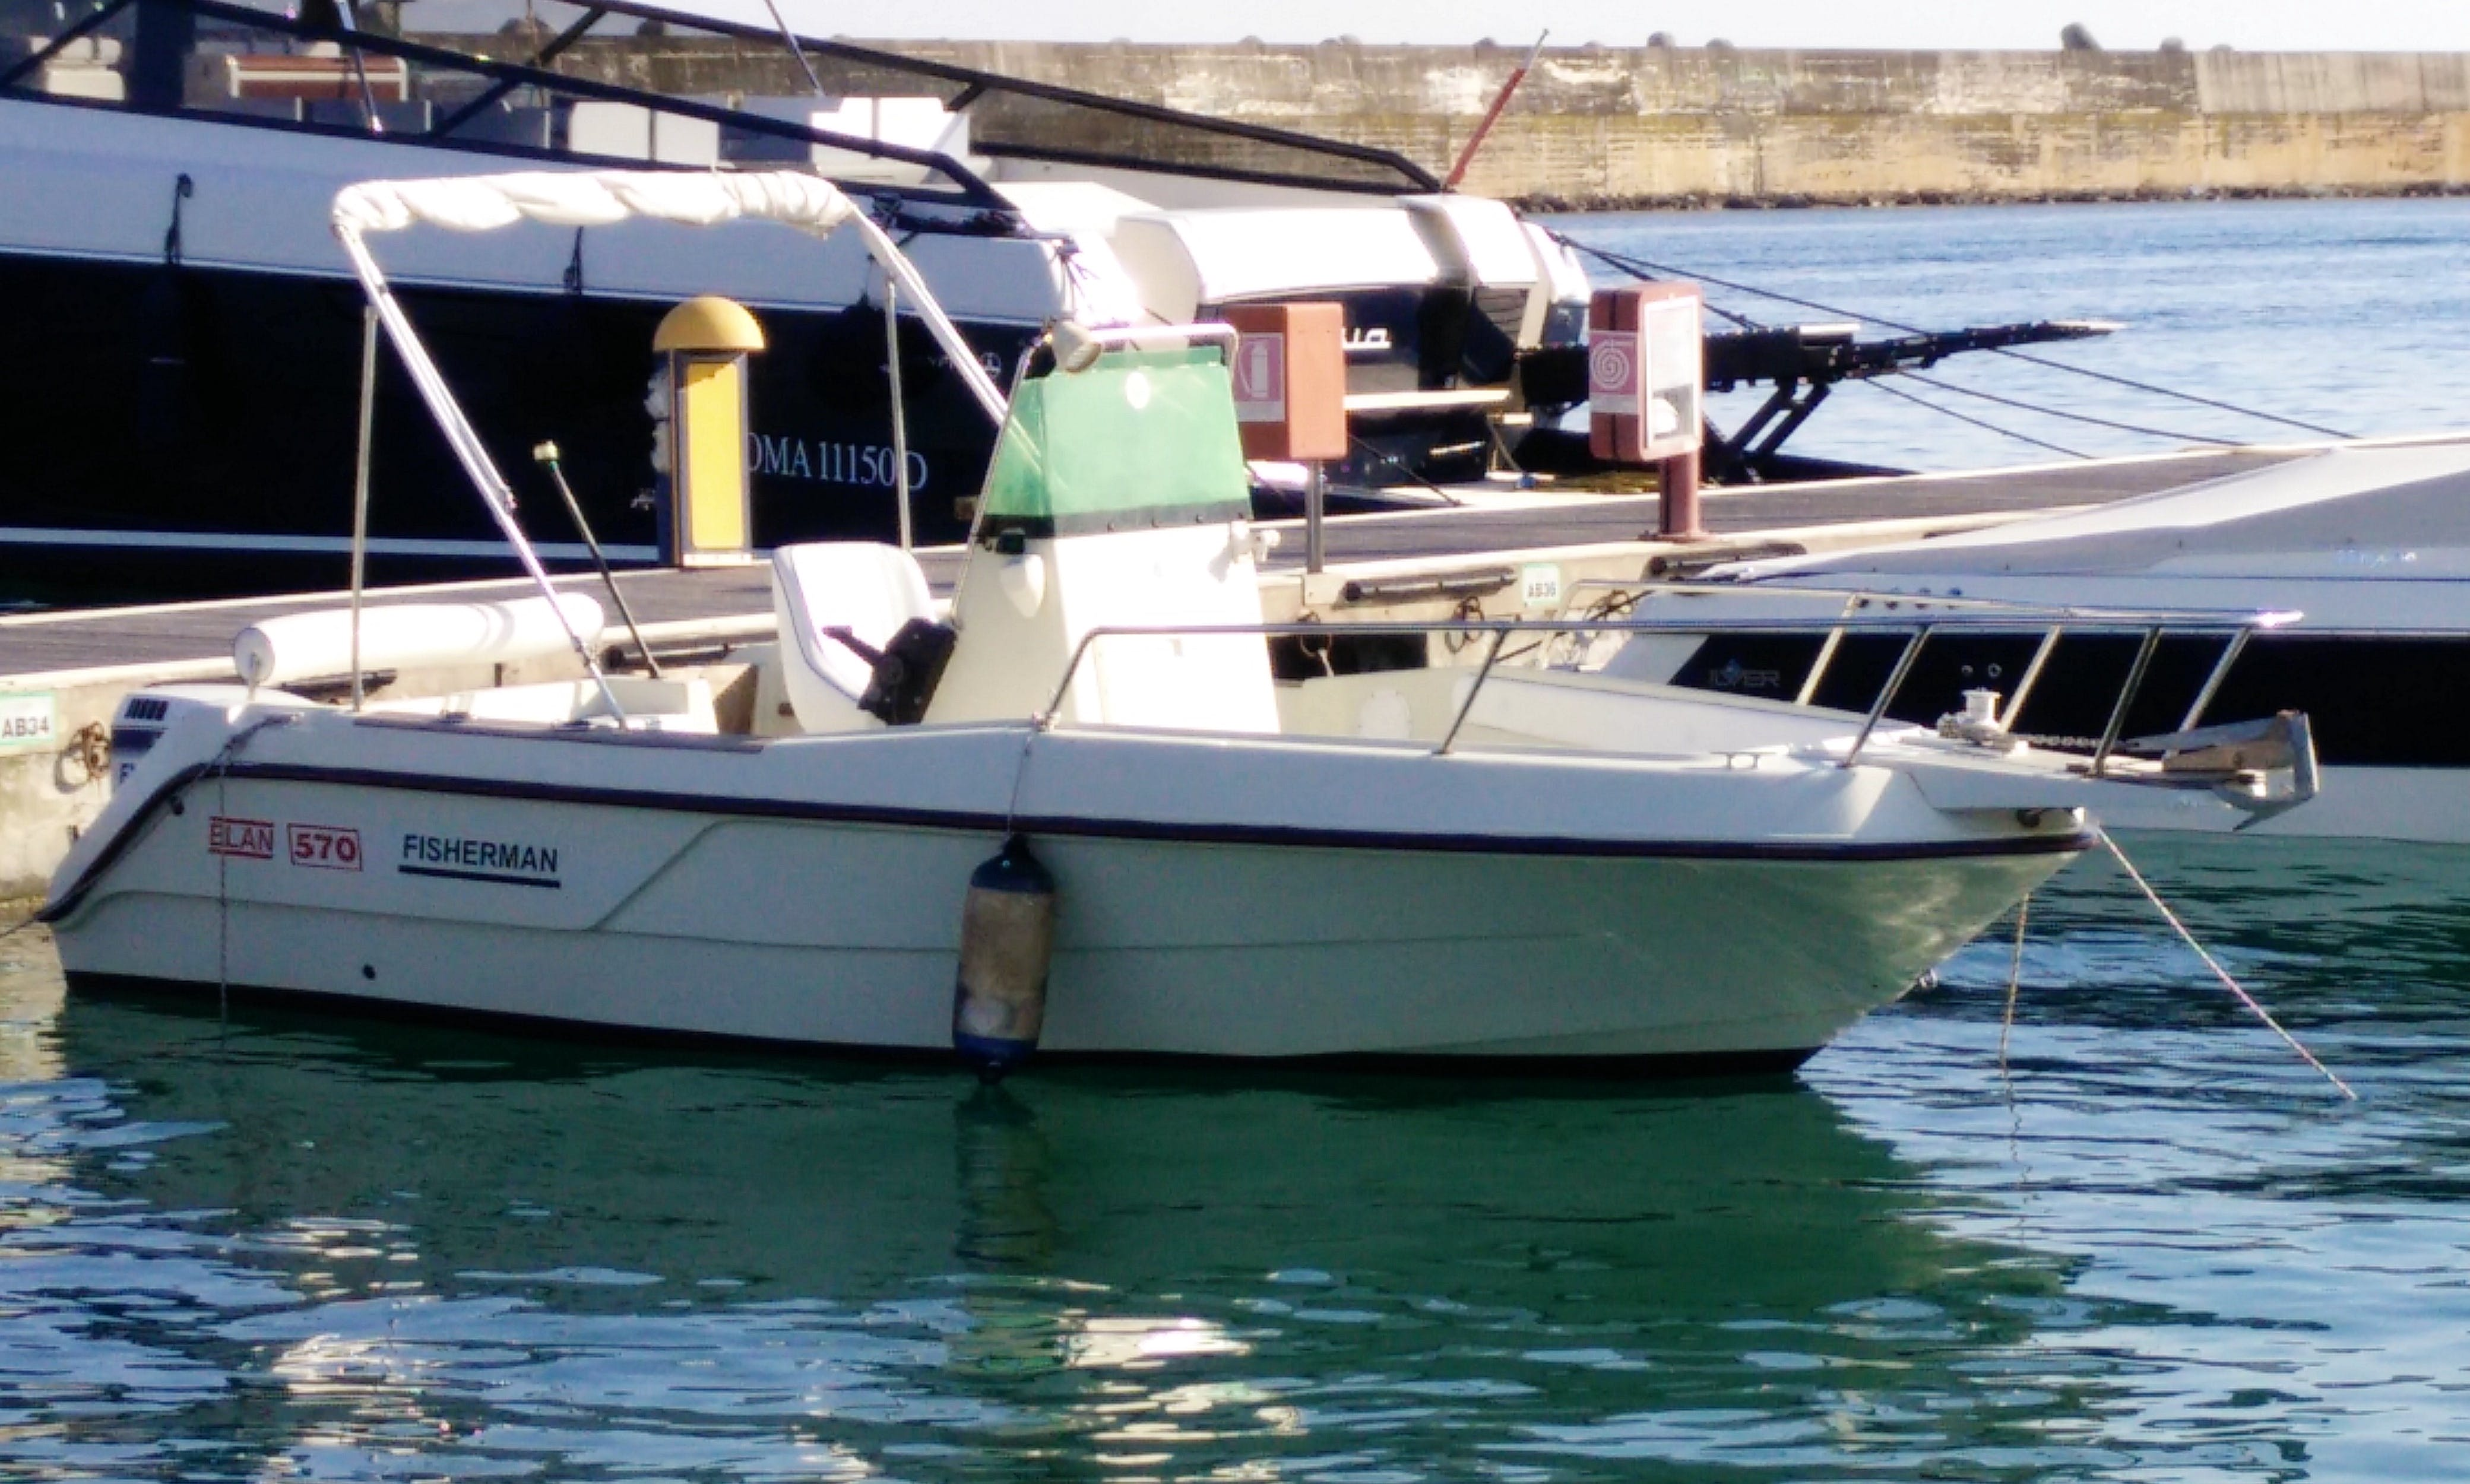 Fishing Trips From Santa Maria di Leuca On Elan 570